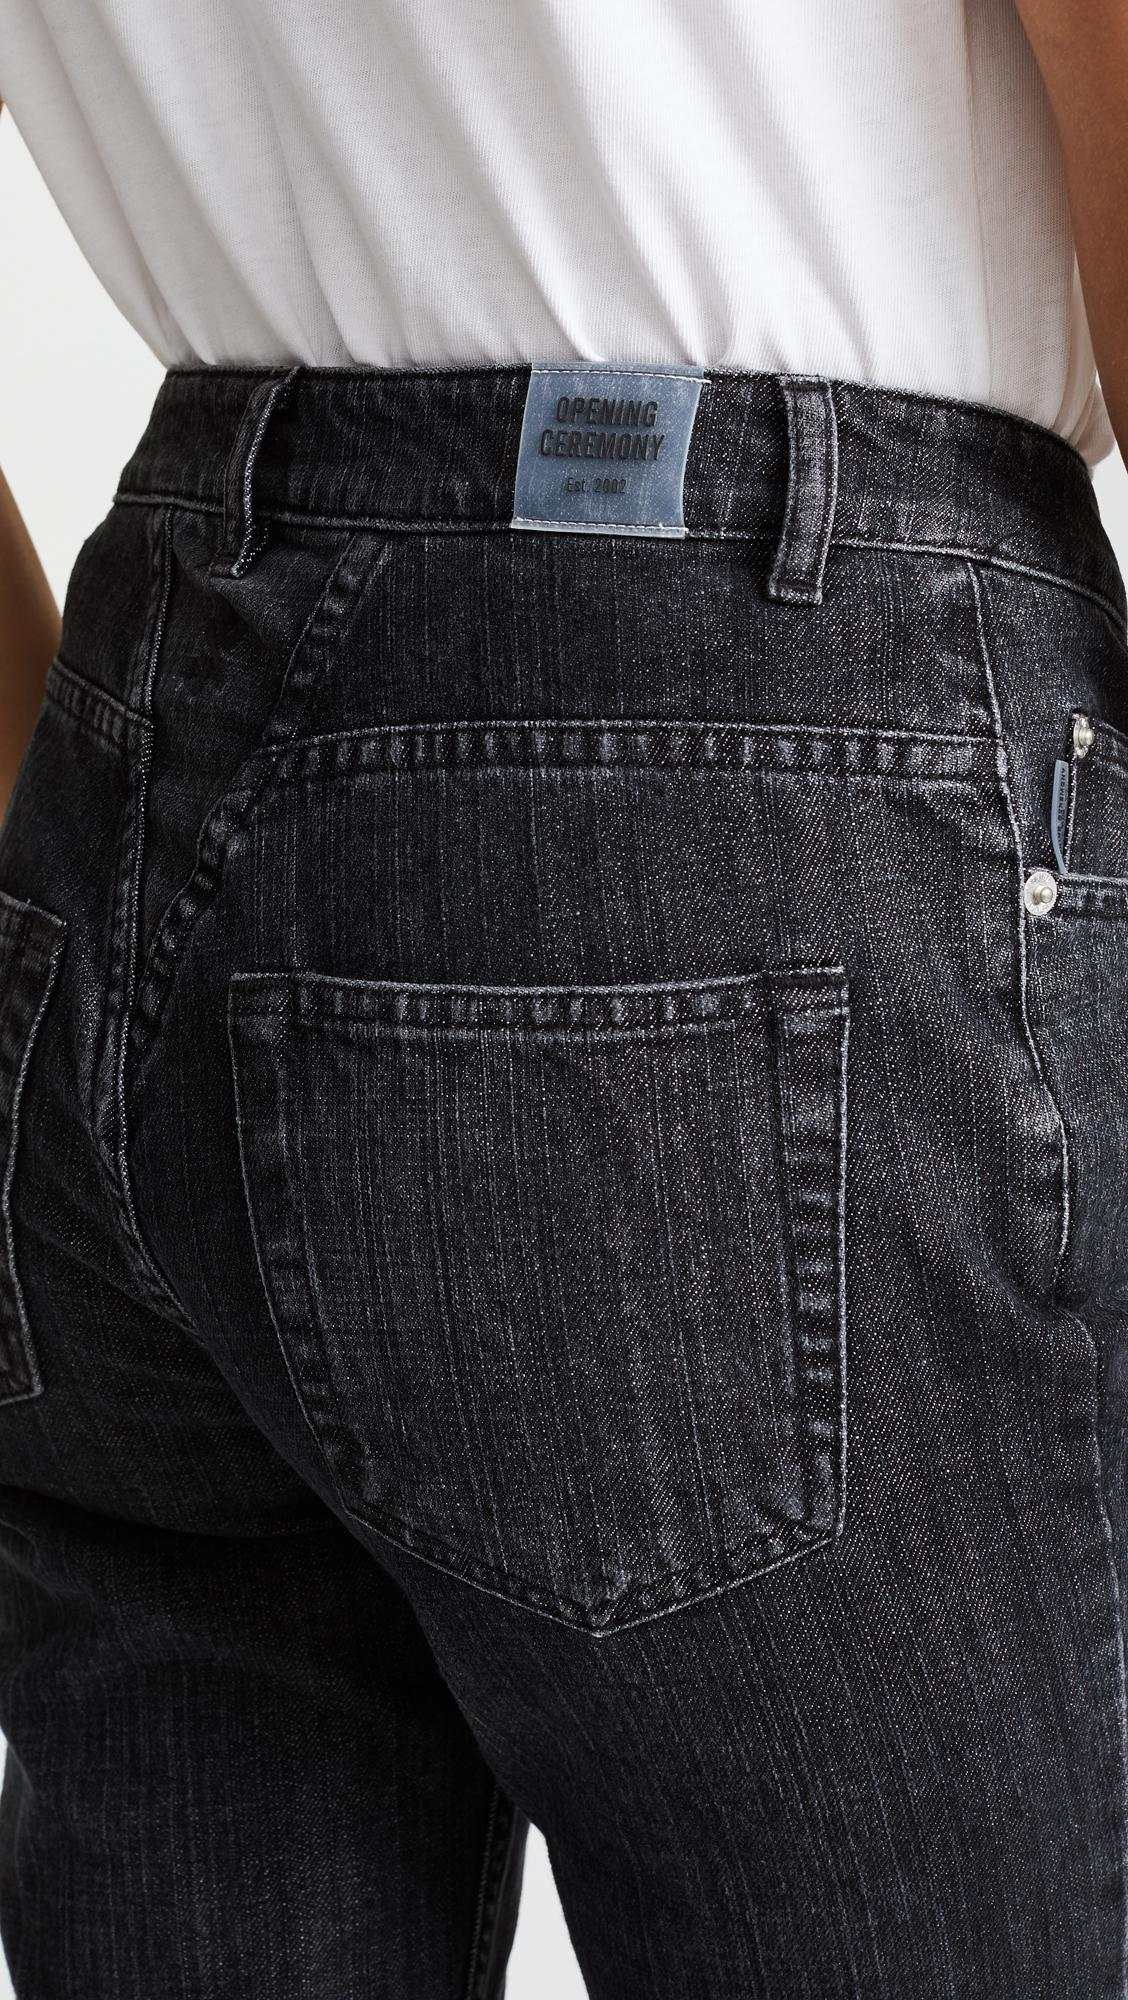 Opening Ceremony Denim Dip Mid-rise Straight-leg Jeans in Black